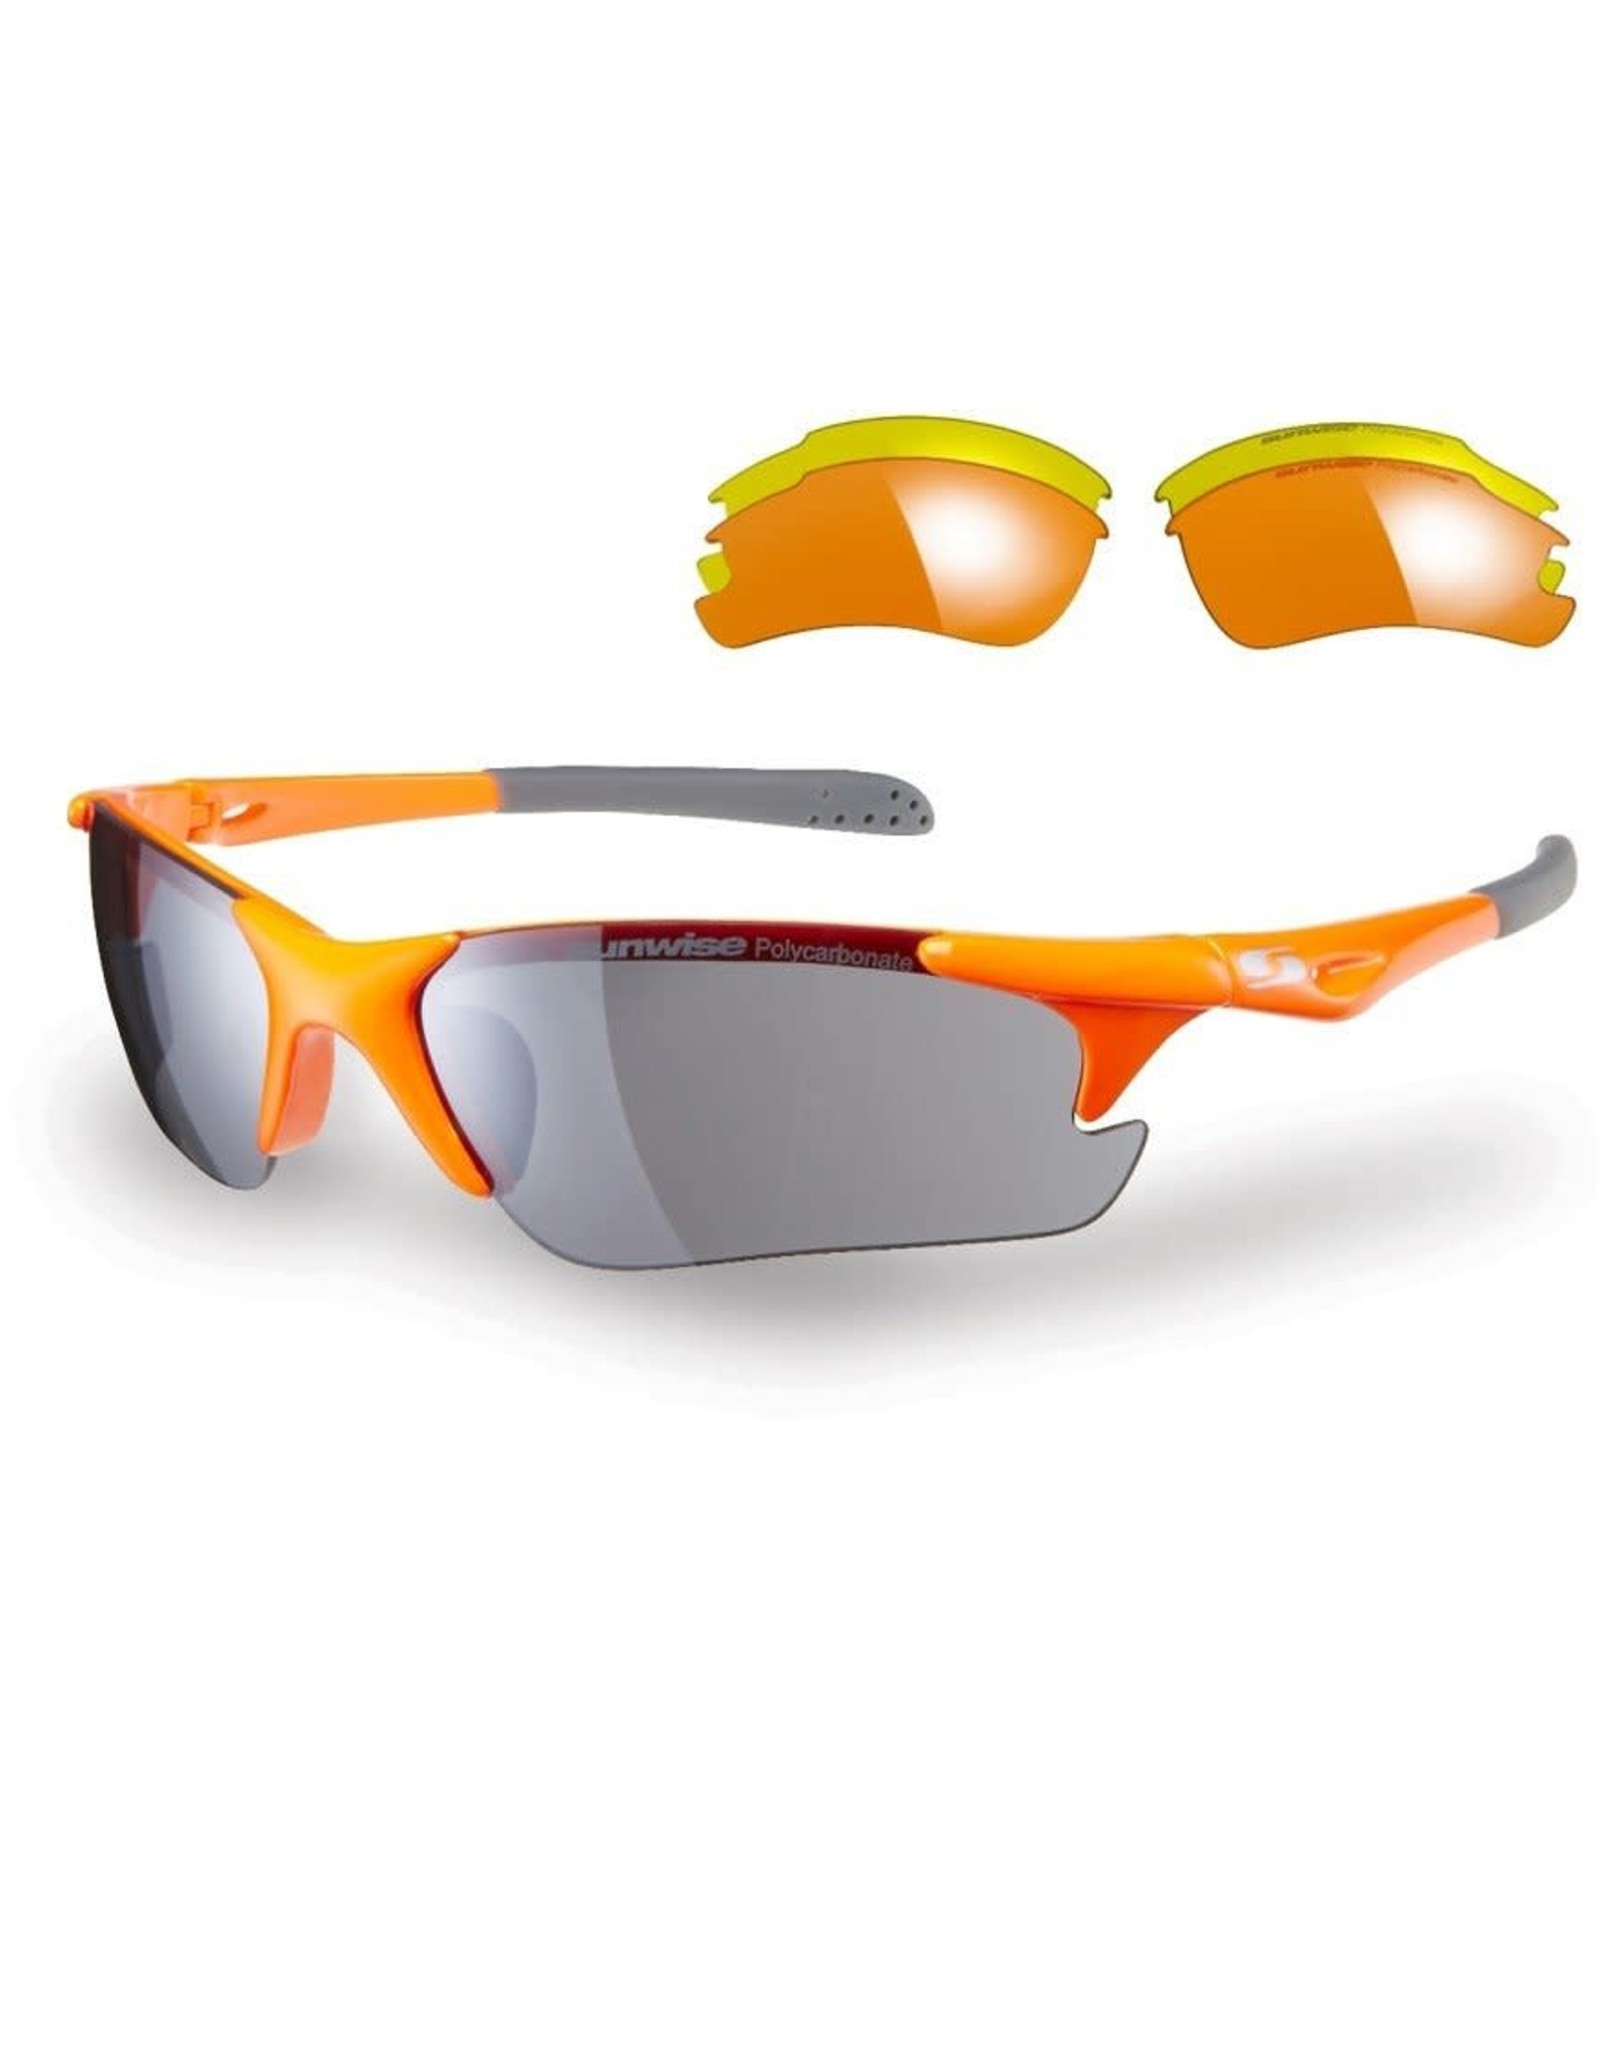 Sunwise Twister Sunglasses Orange